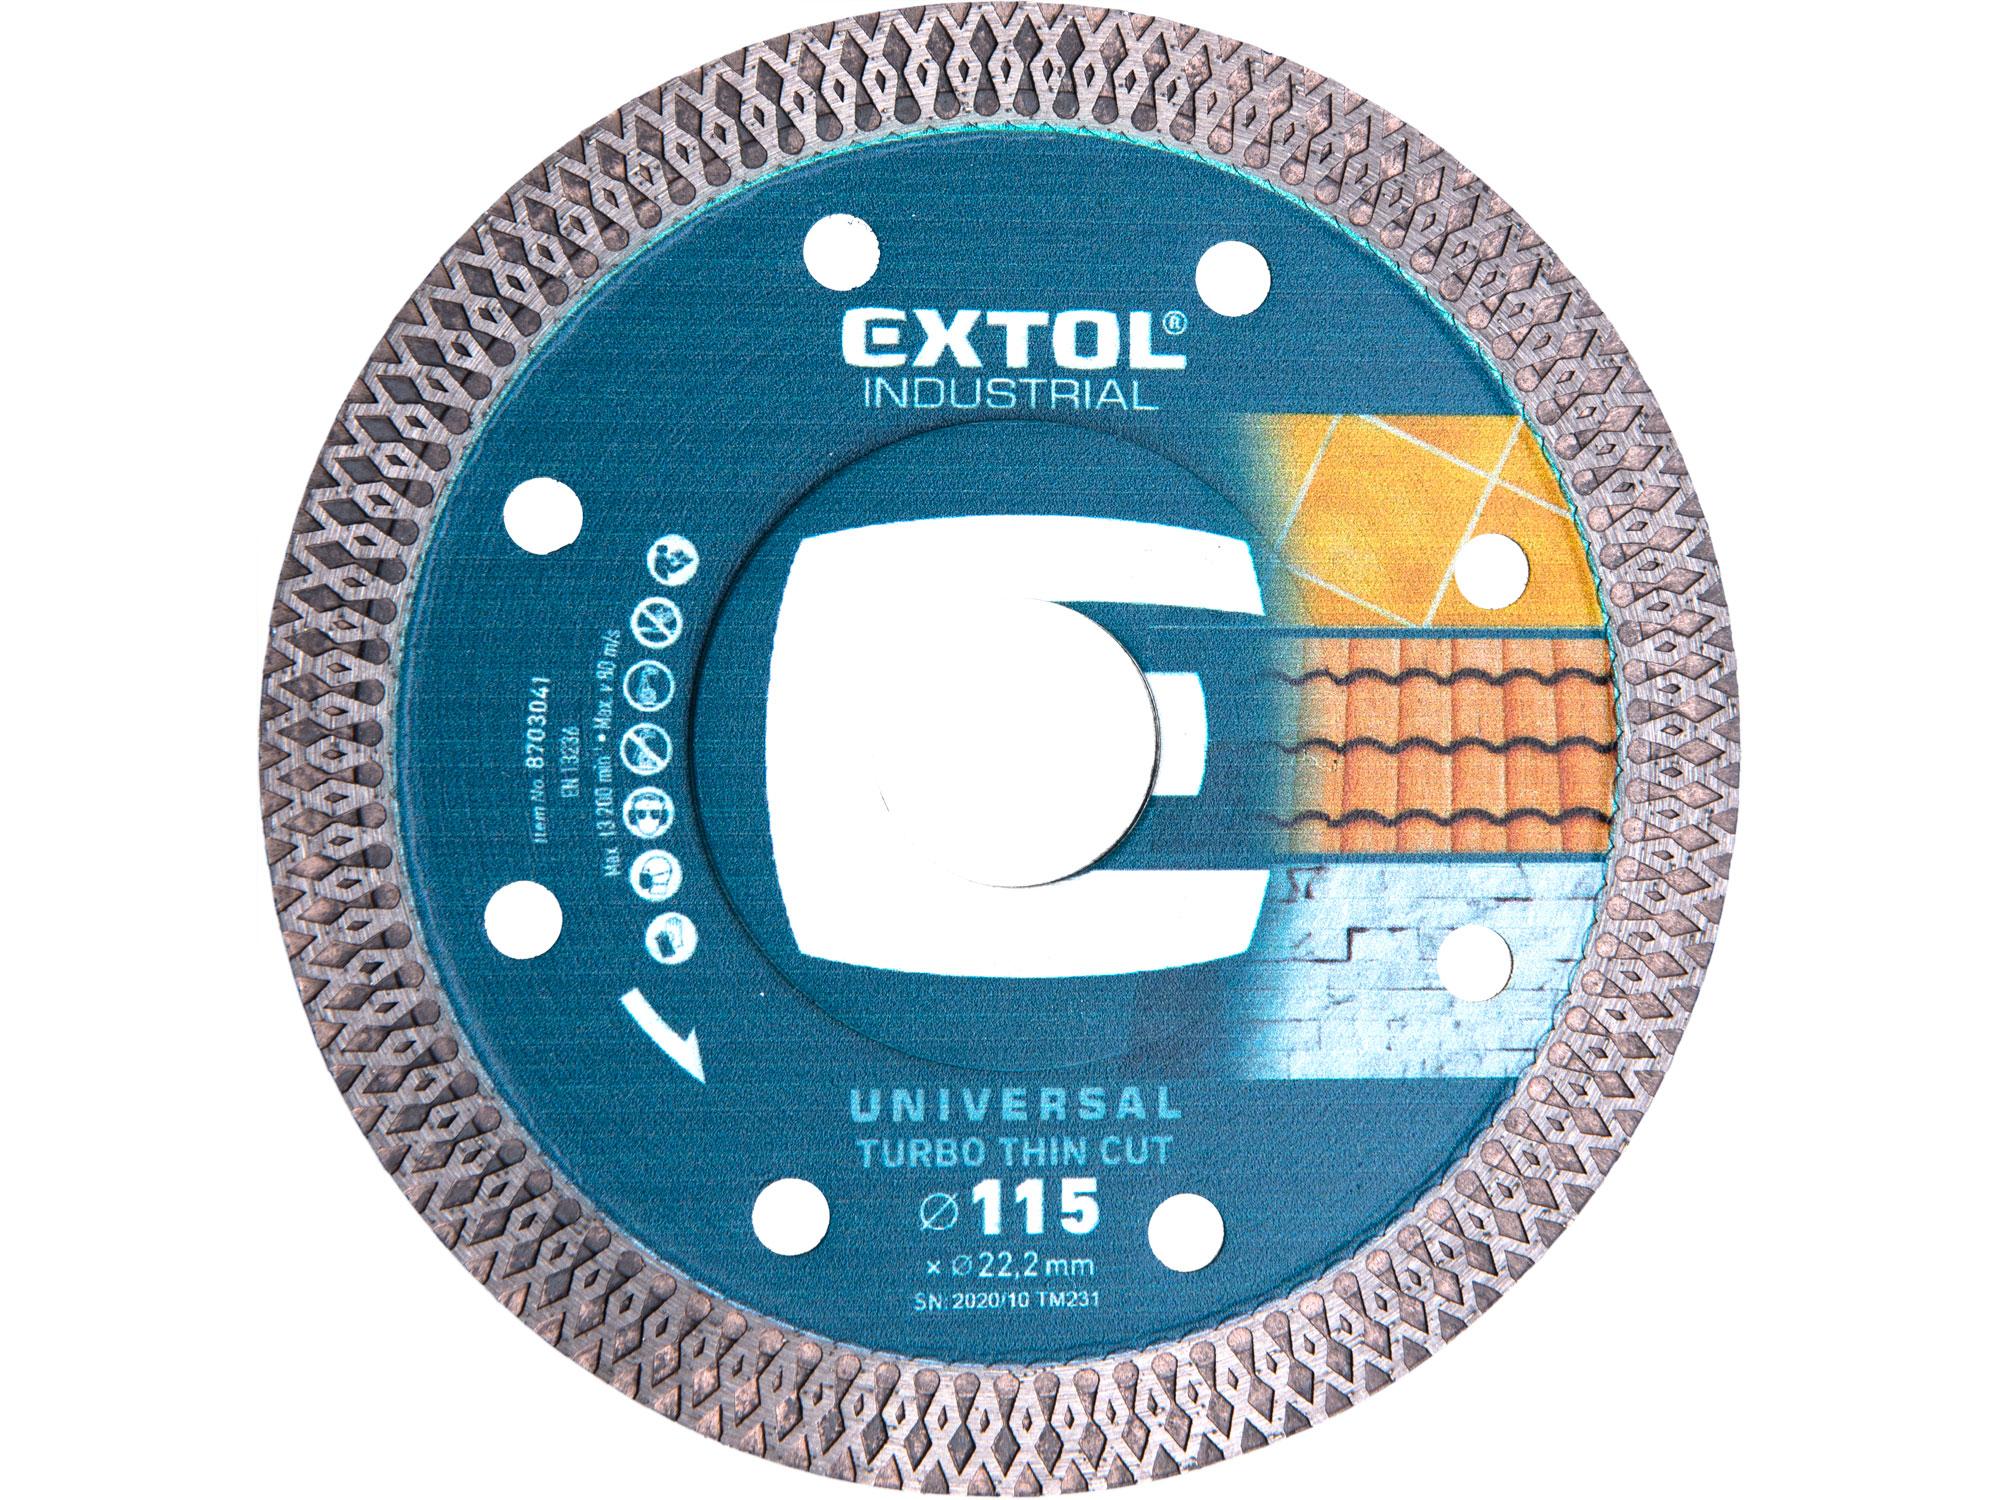 115mm Diamond Cutting Disc, Thin Wet&Dry Cut, 115mm Dia,22.2mm ID, 1.5mm thk